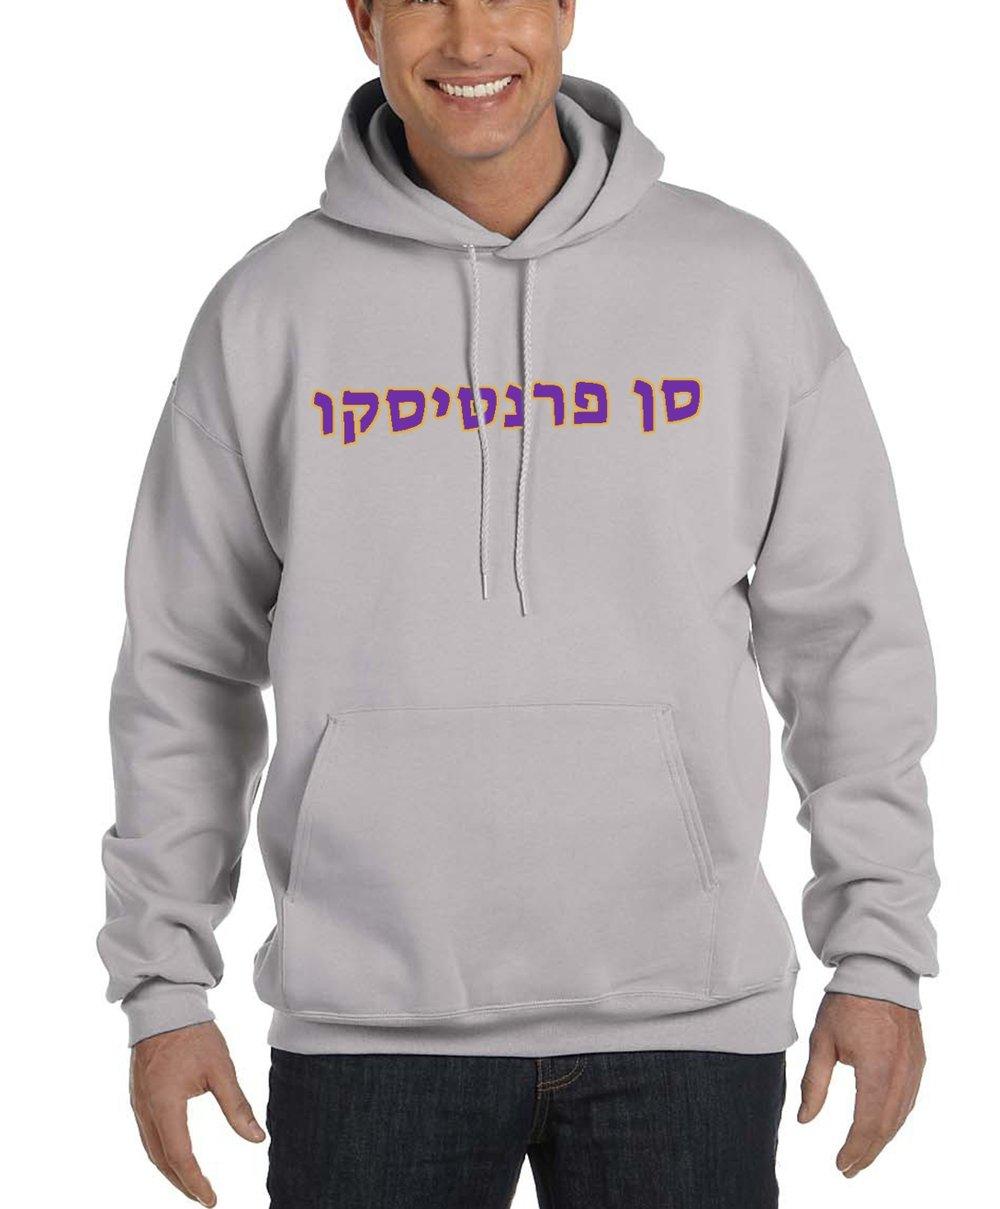 Sanfran_hoodie_purpleheathergray.jpg